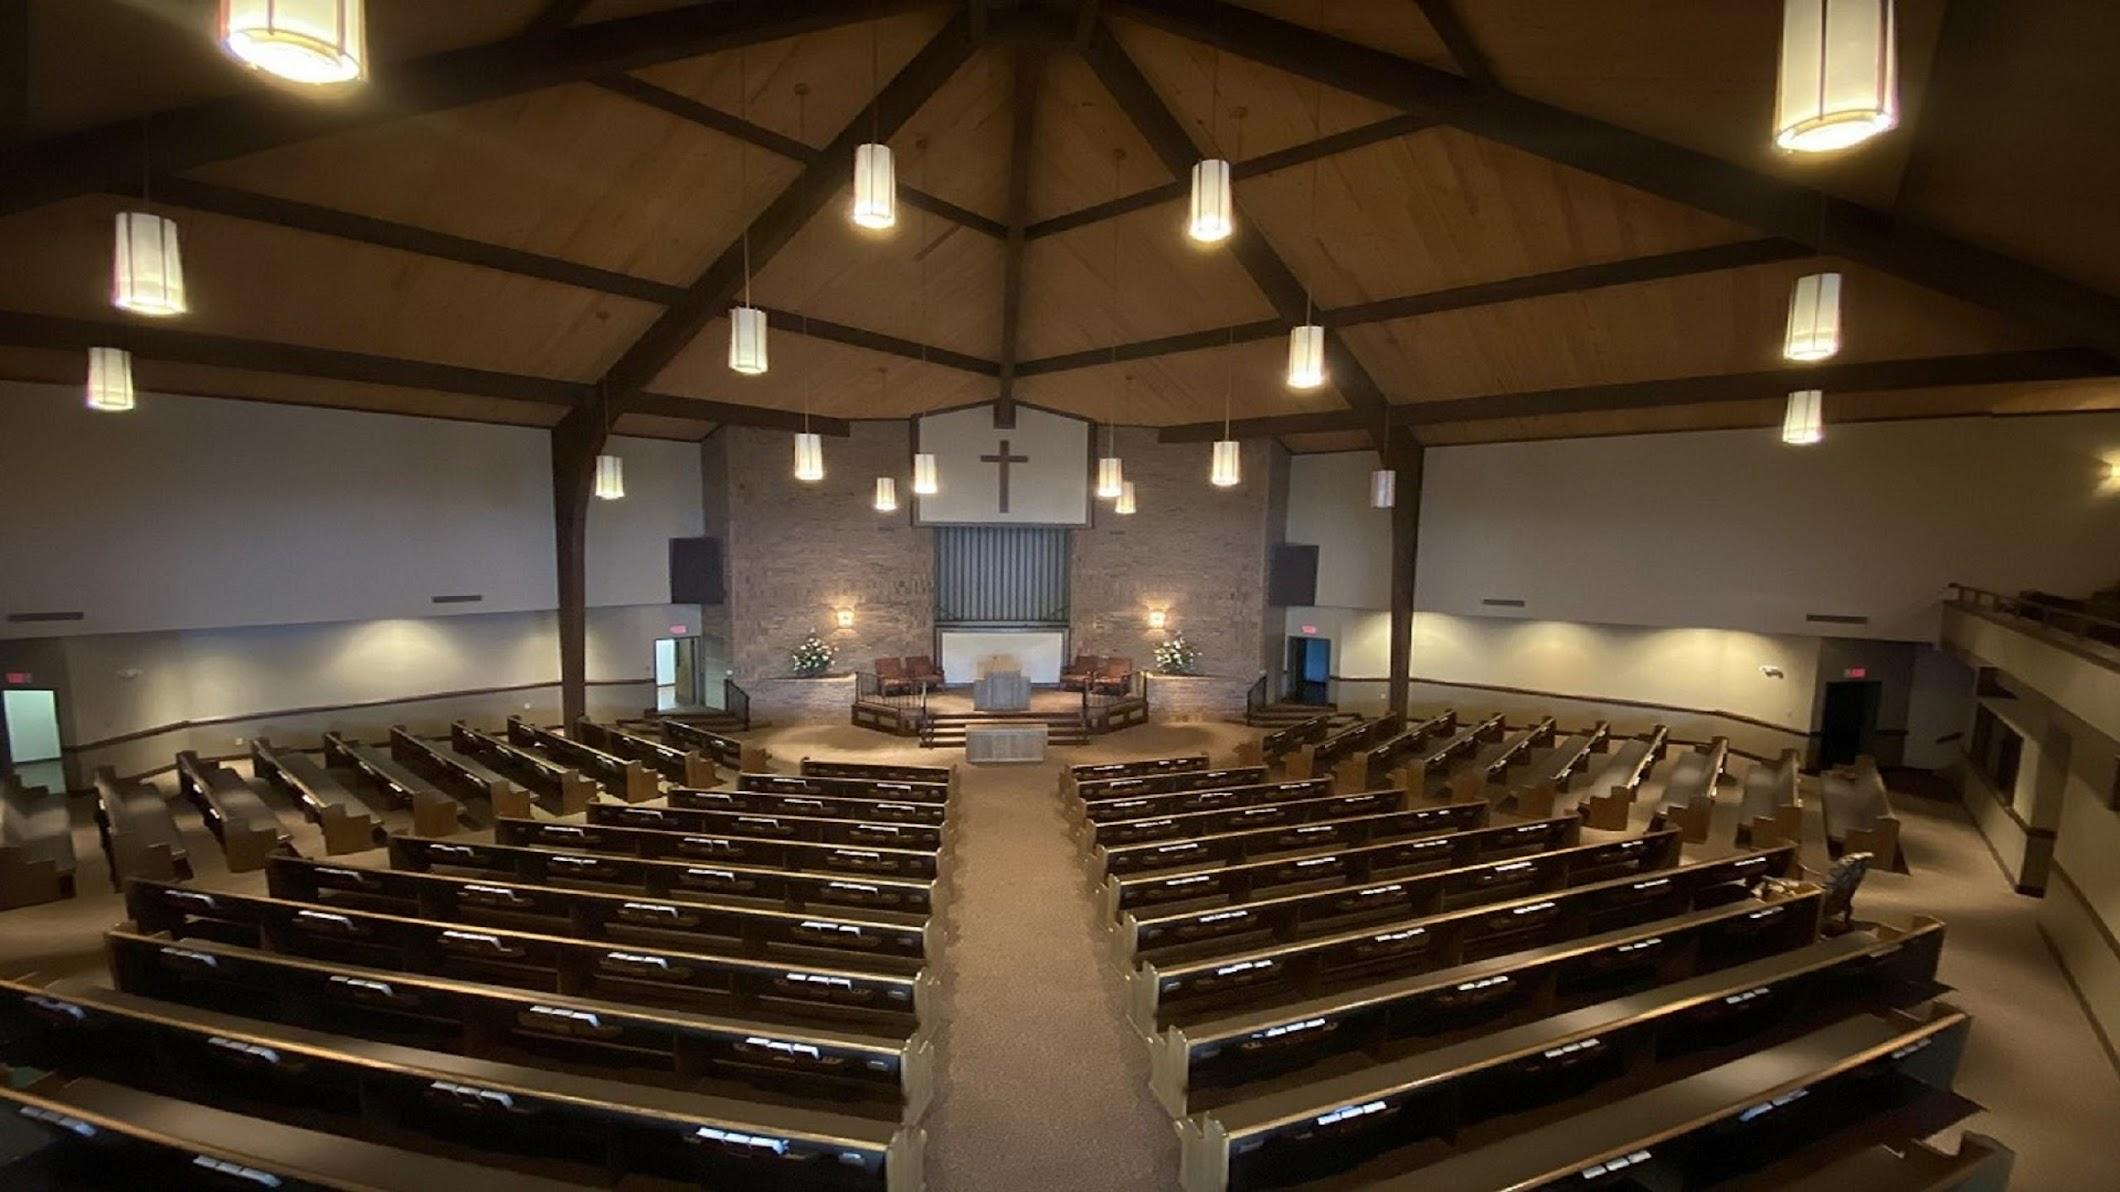 Plainview church of Christ, Hazel Green